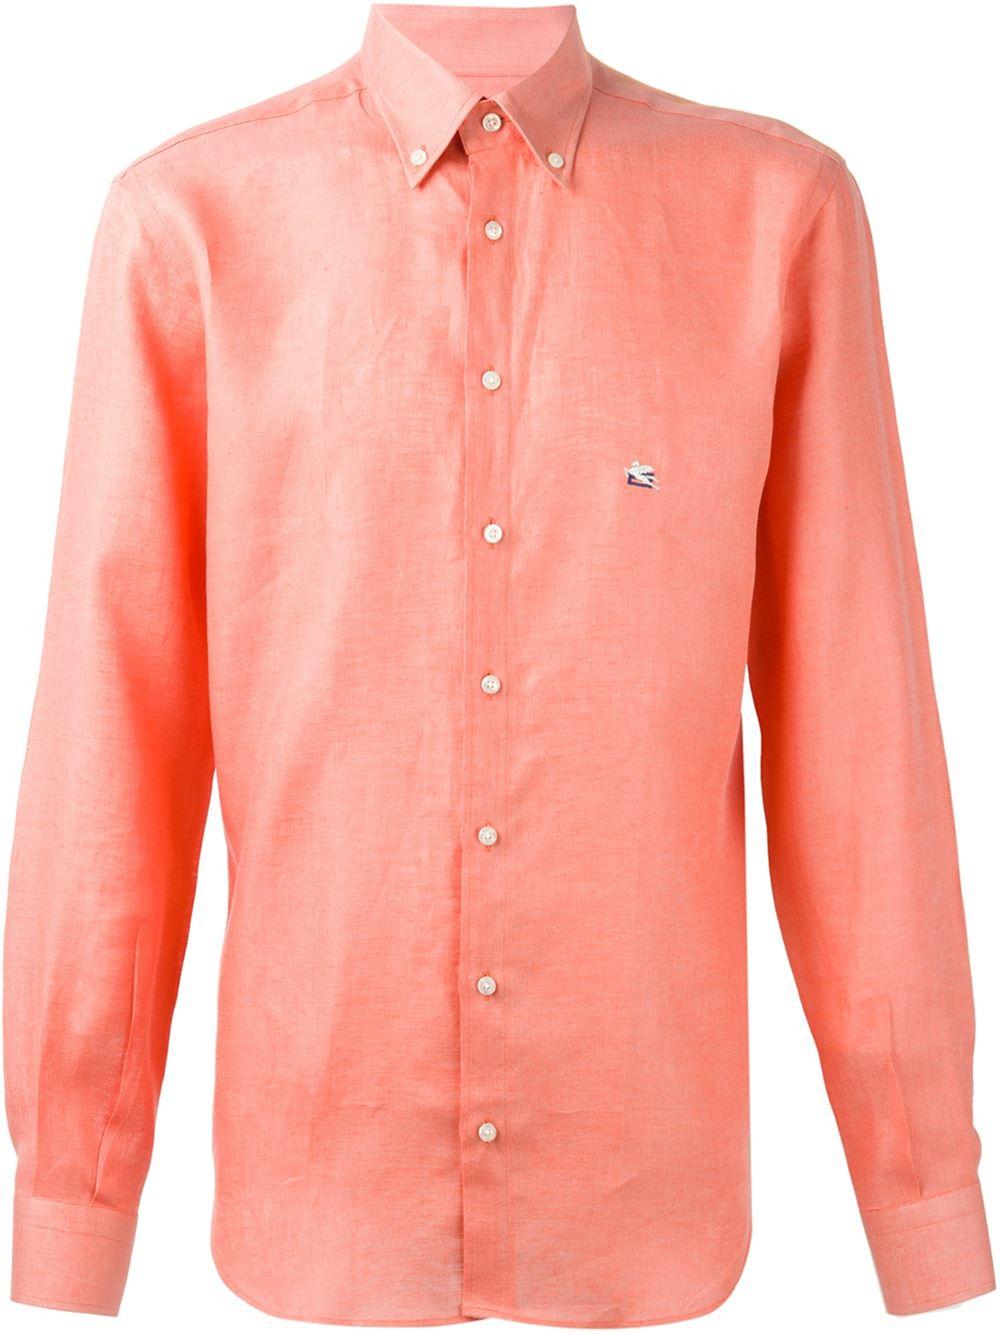 Etro Button Down Collar Shirt In Orange For Men Yellow